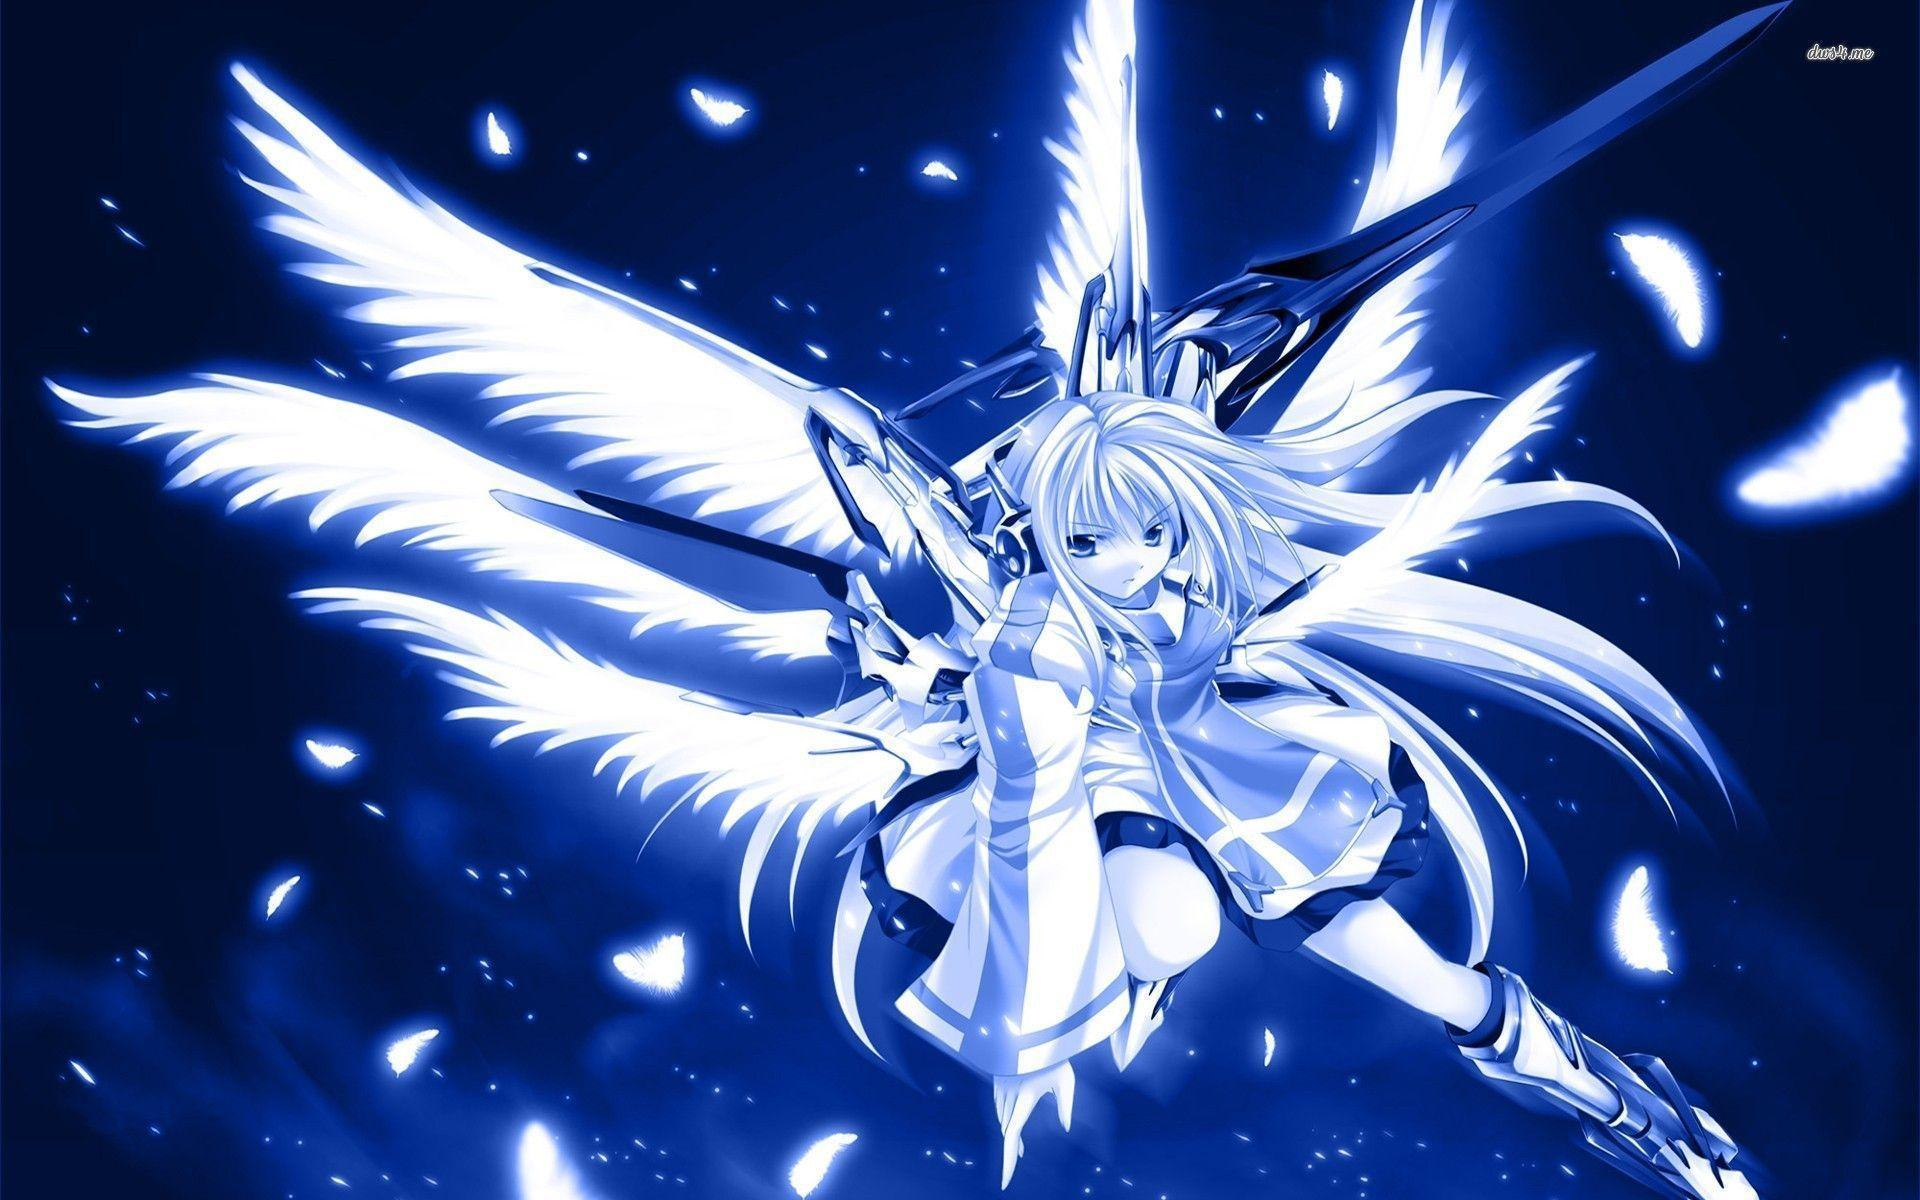 Anime angels pussy photos 1